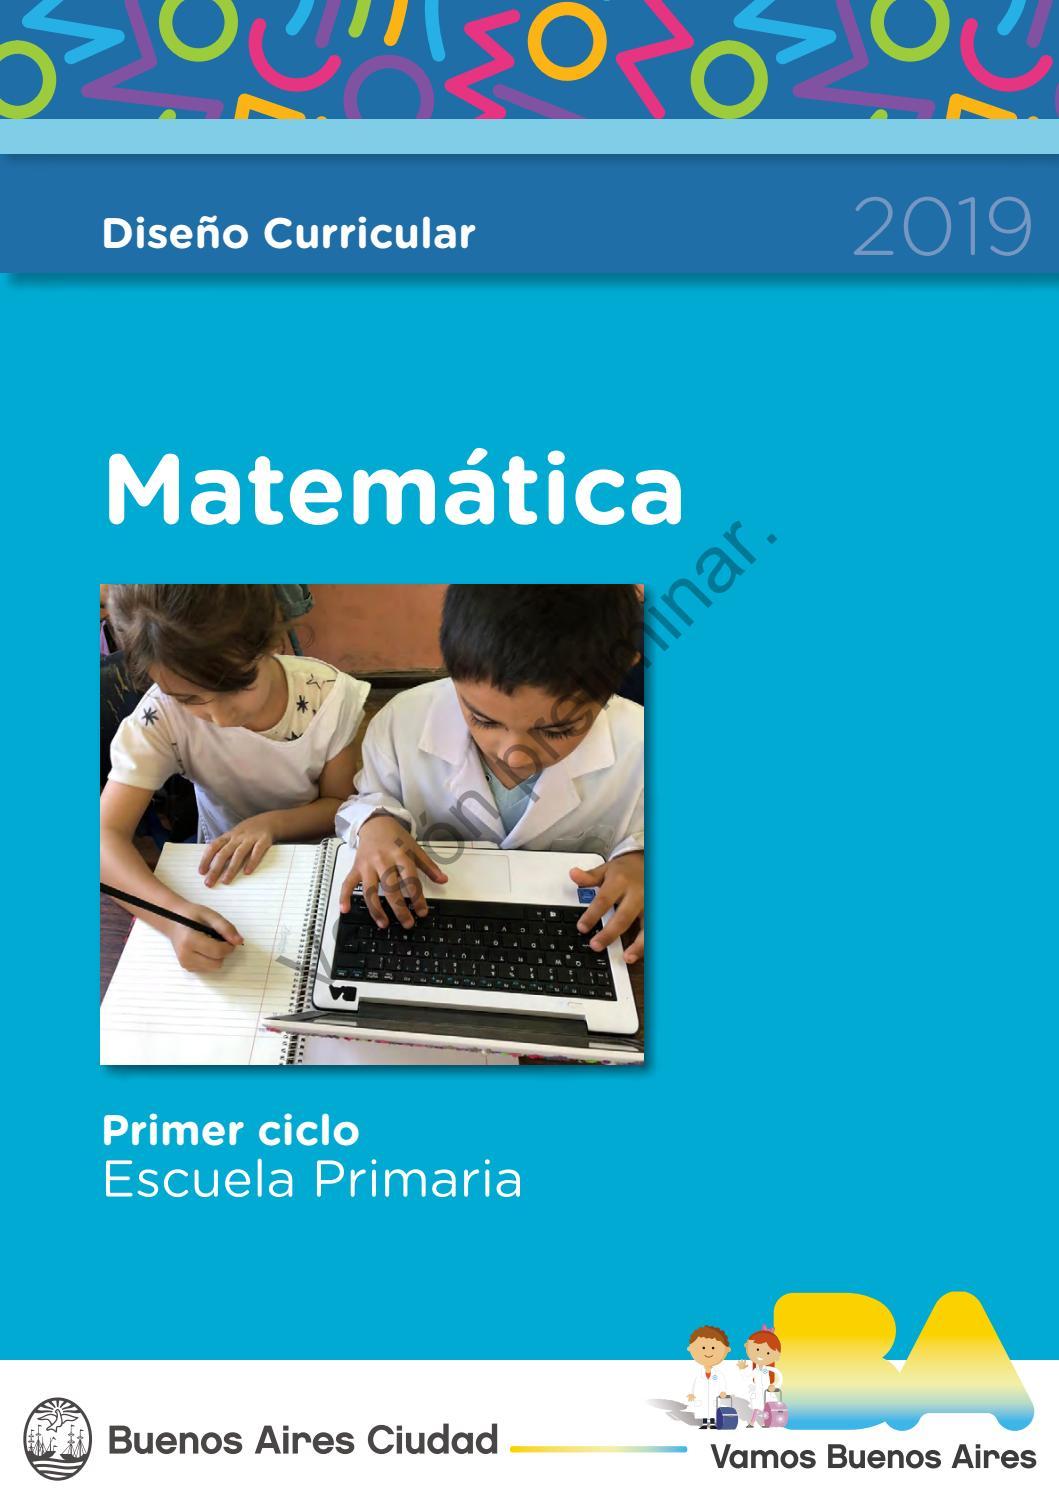 Diseño Curricular Matemática By Docentes De 10 Issuu